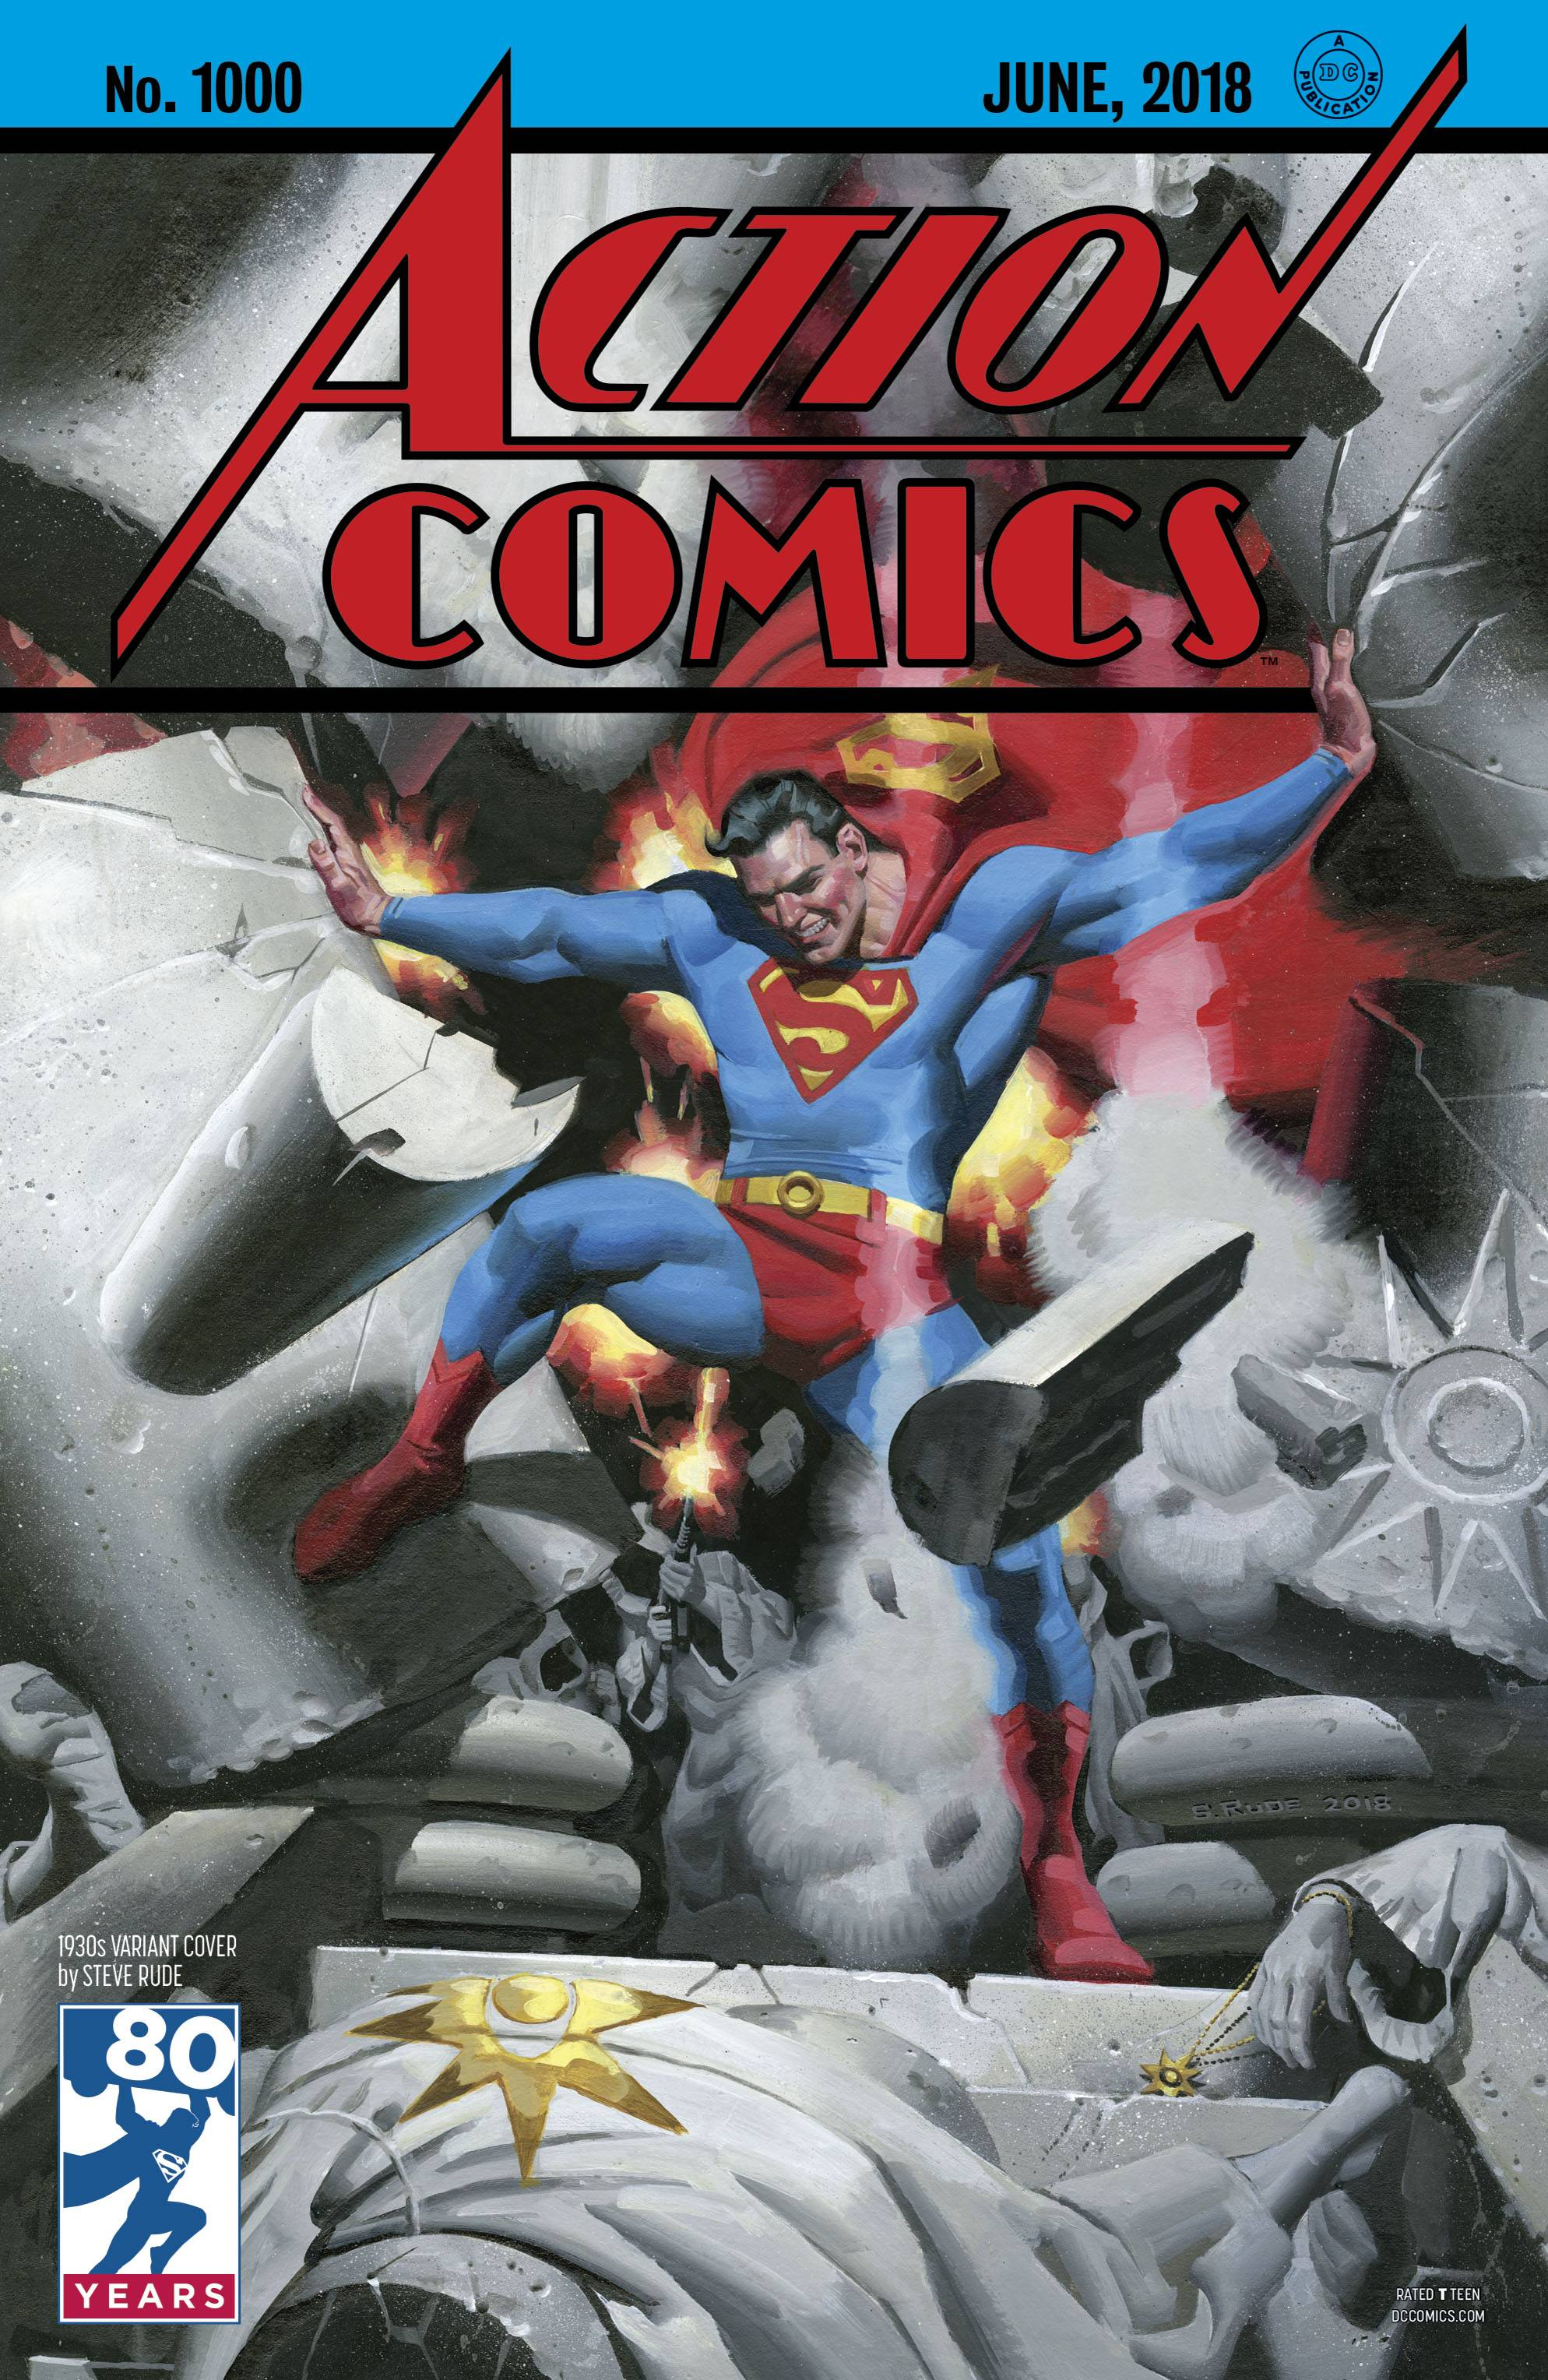 action comics #1000 1930s.jpg